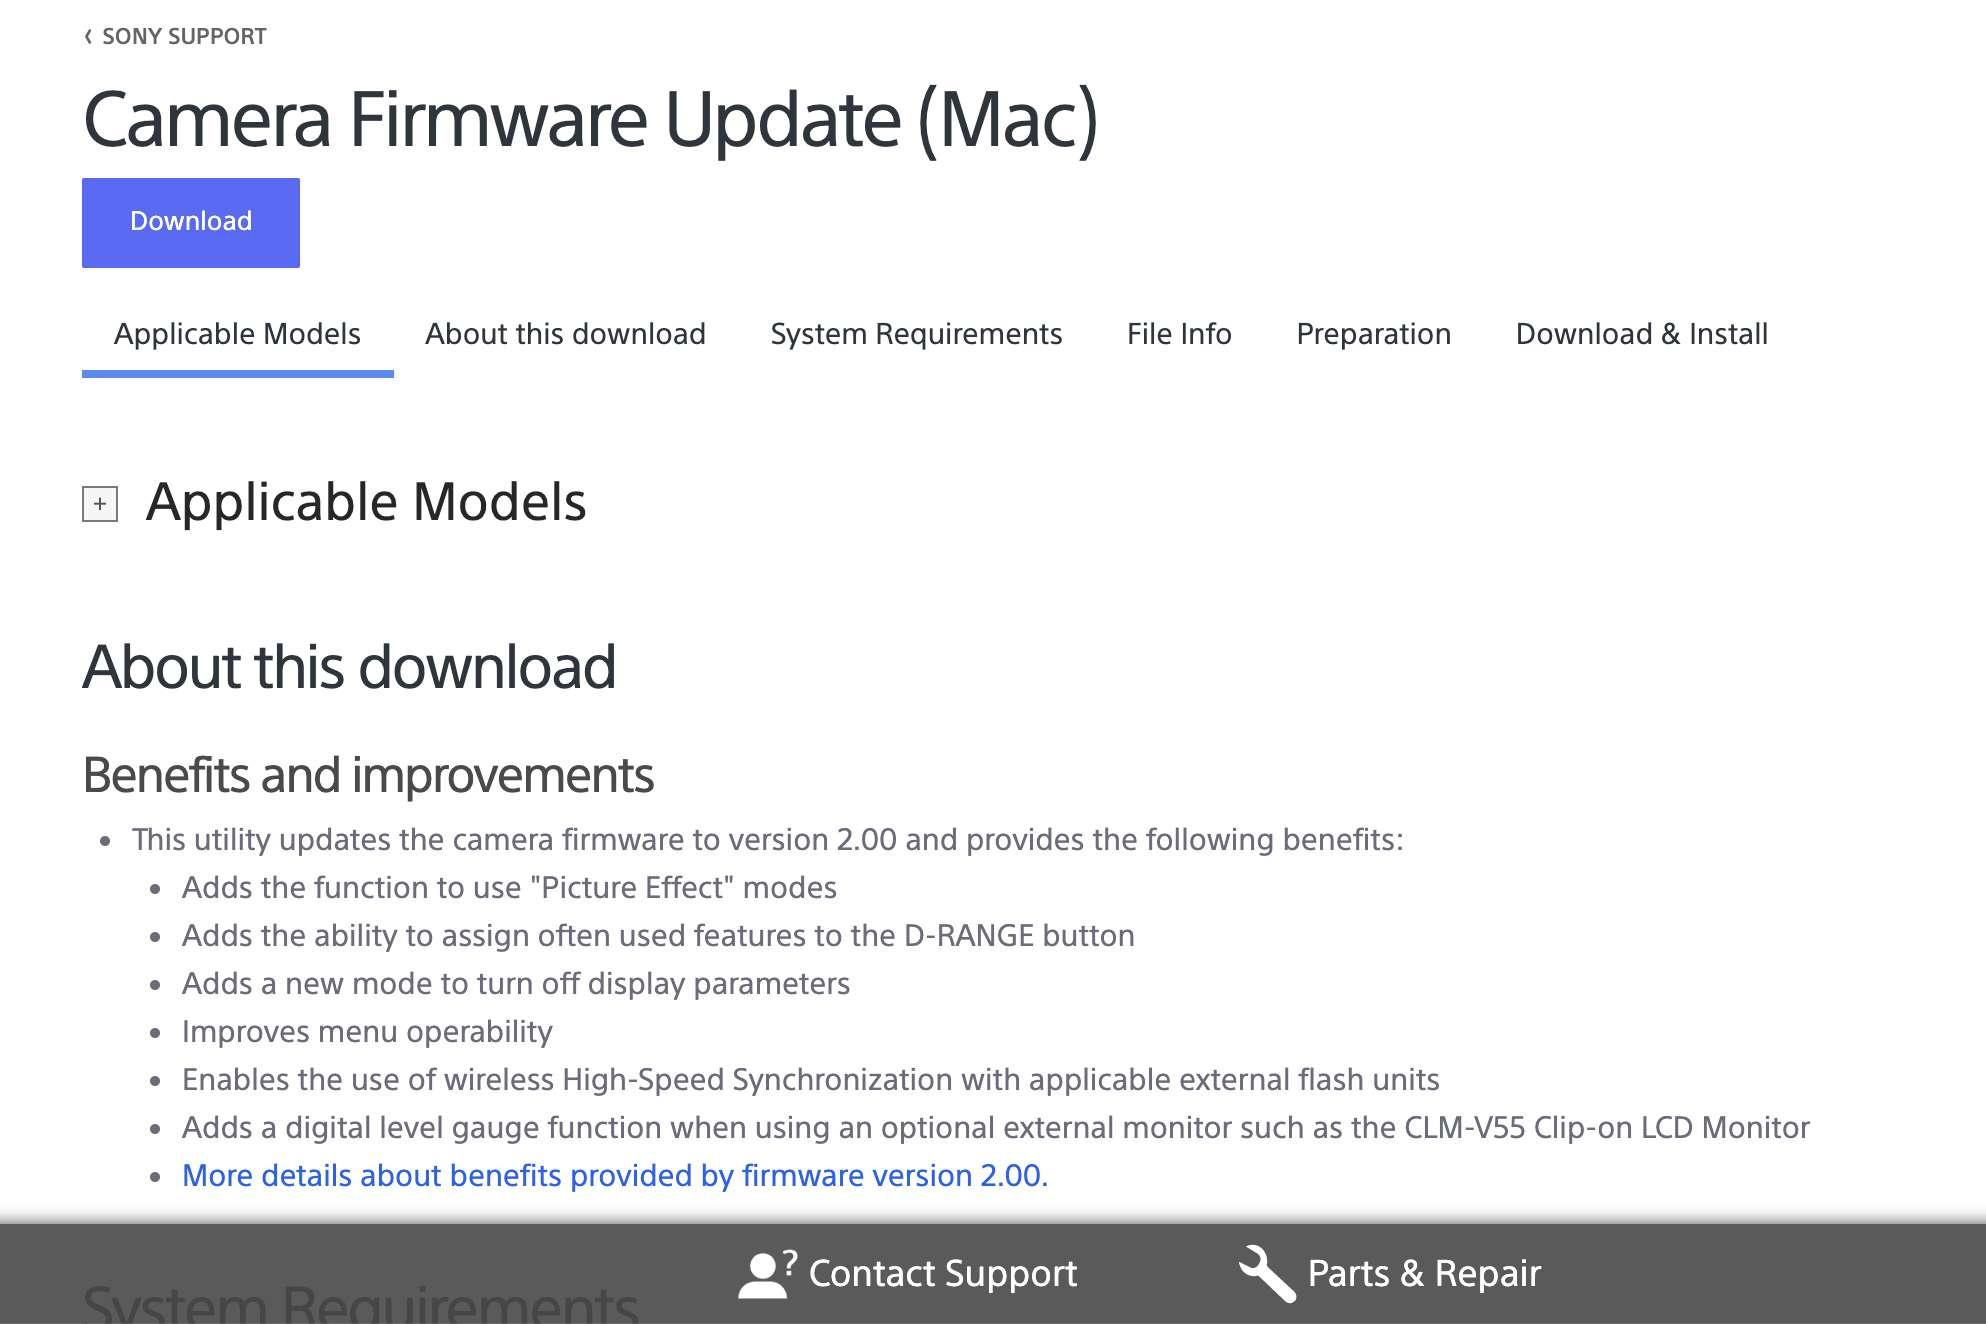 Sony camera firmware update screen